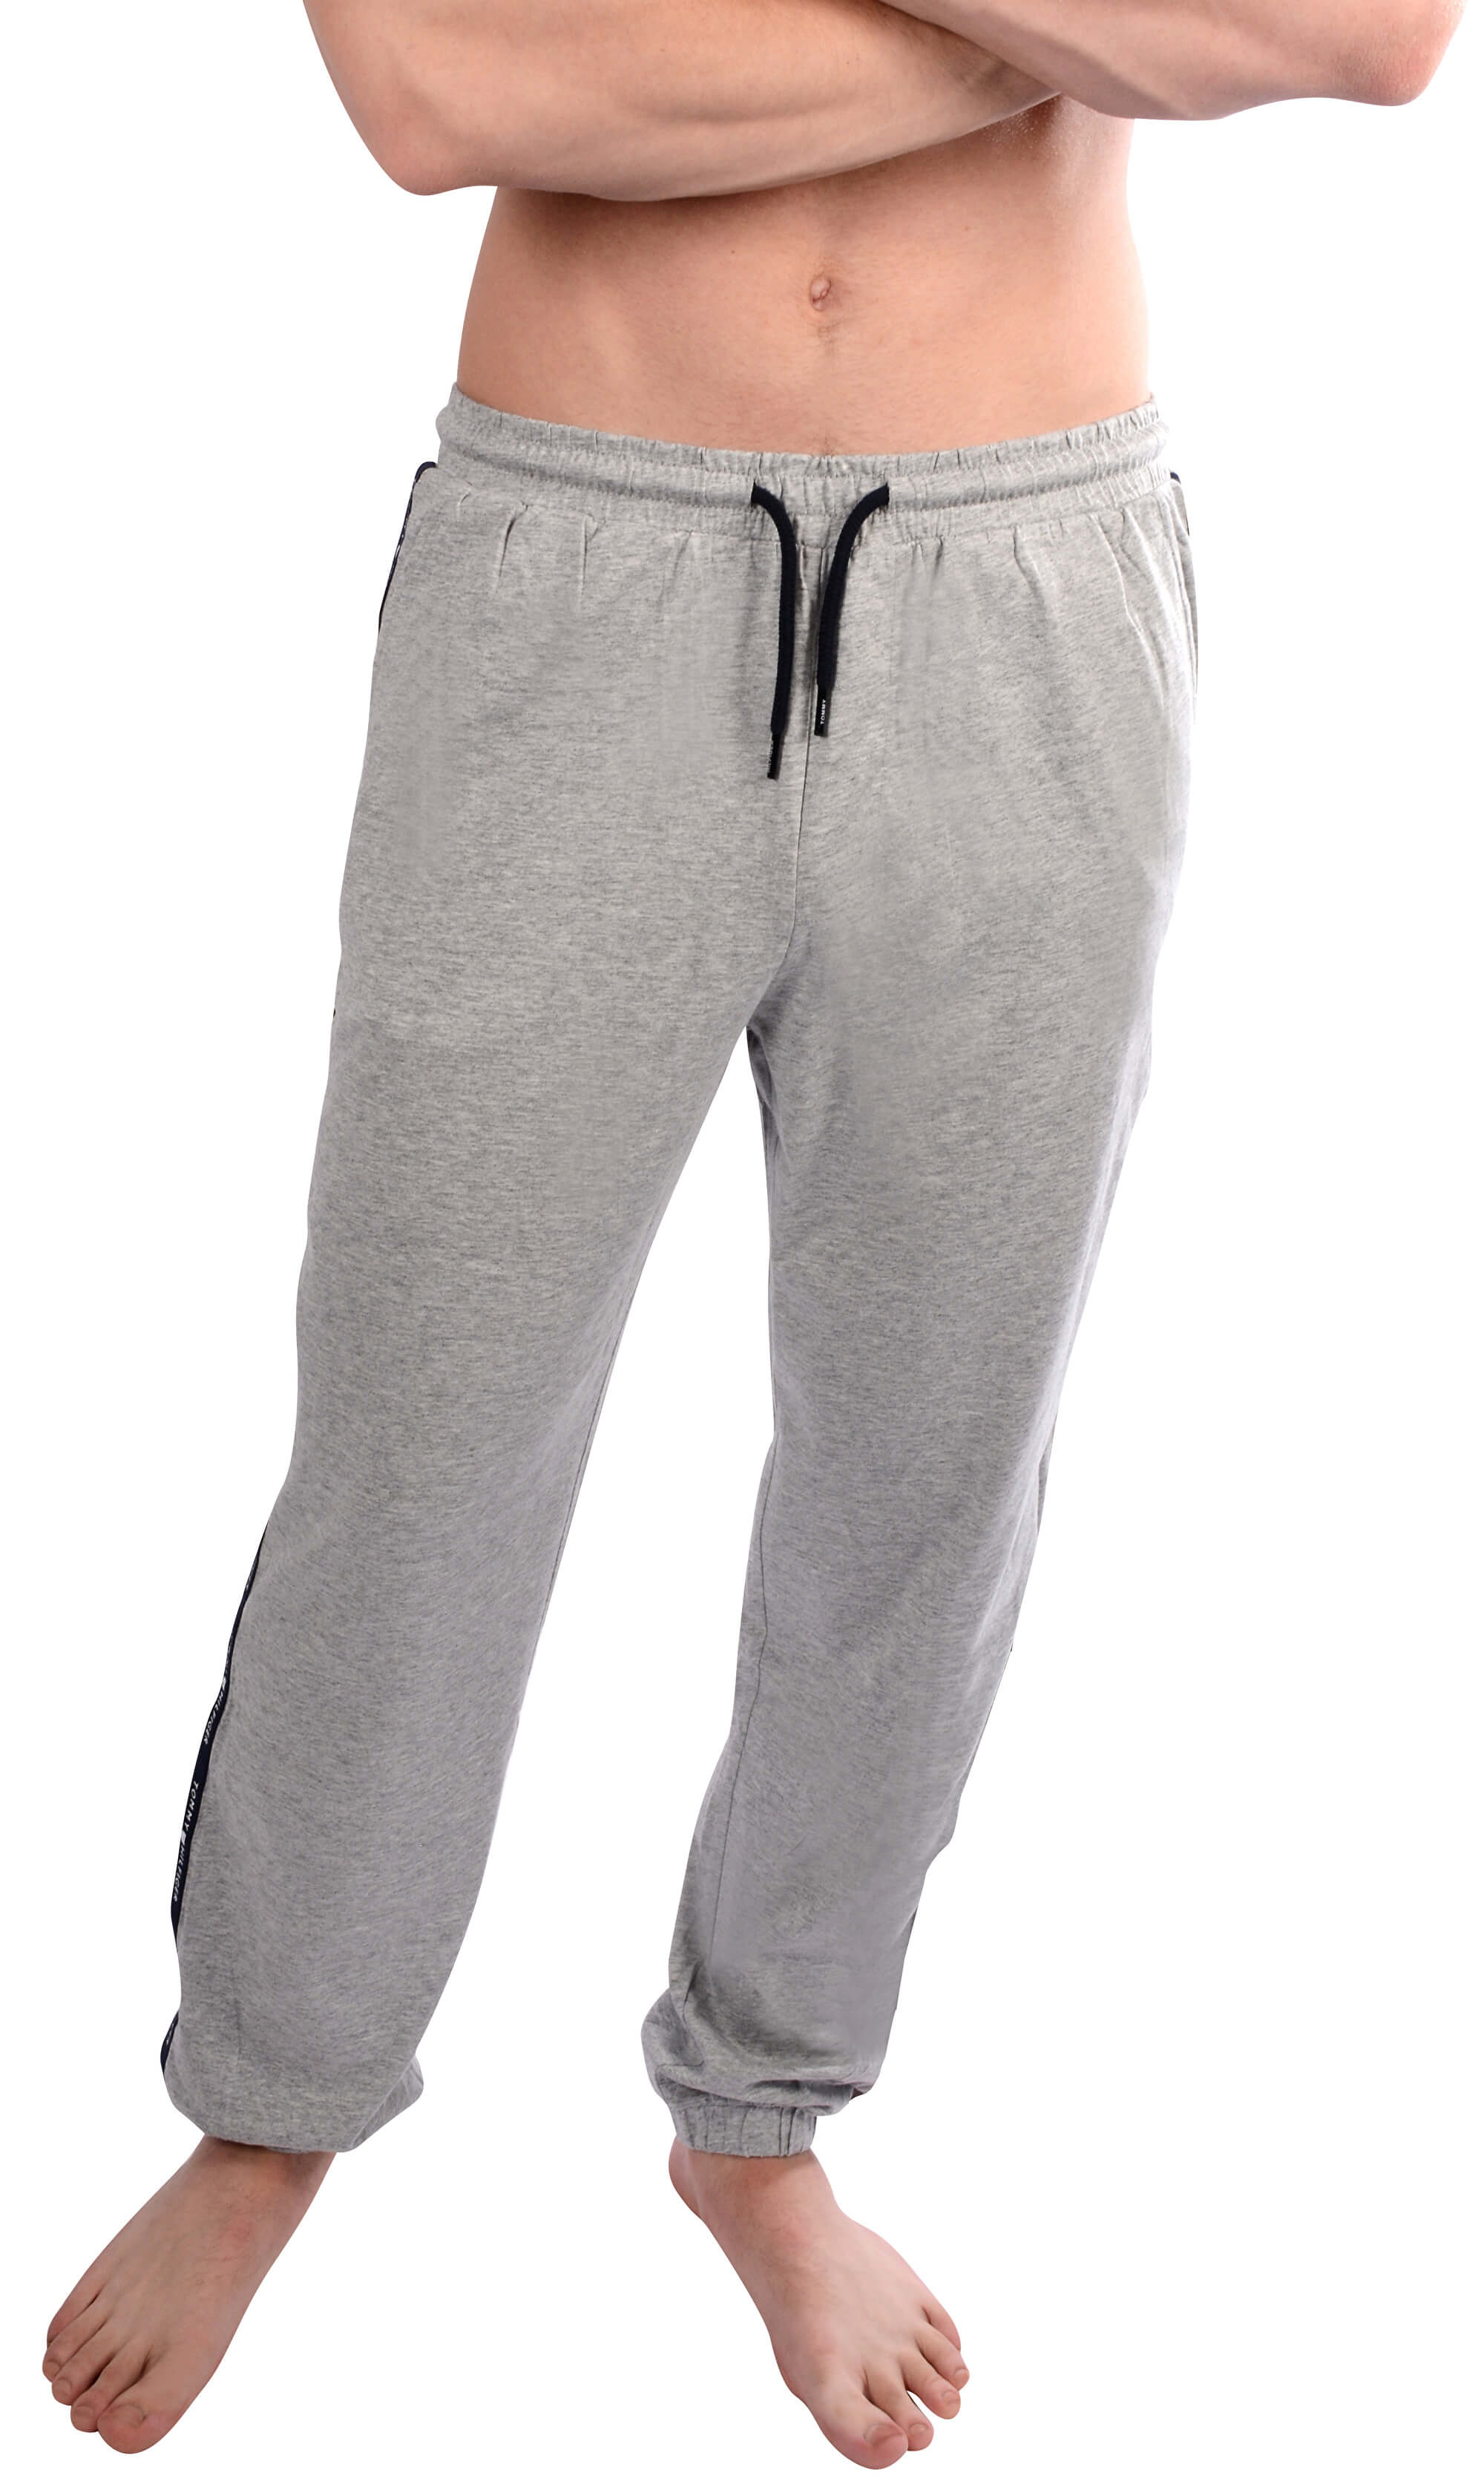 Tommy Hilfiger Pánske nohavice Modern Classic Pant UM0UM00274-004 Grey  Heather 0b09d55cca